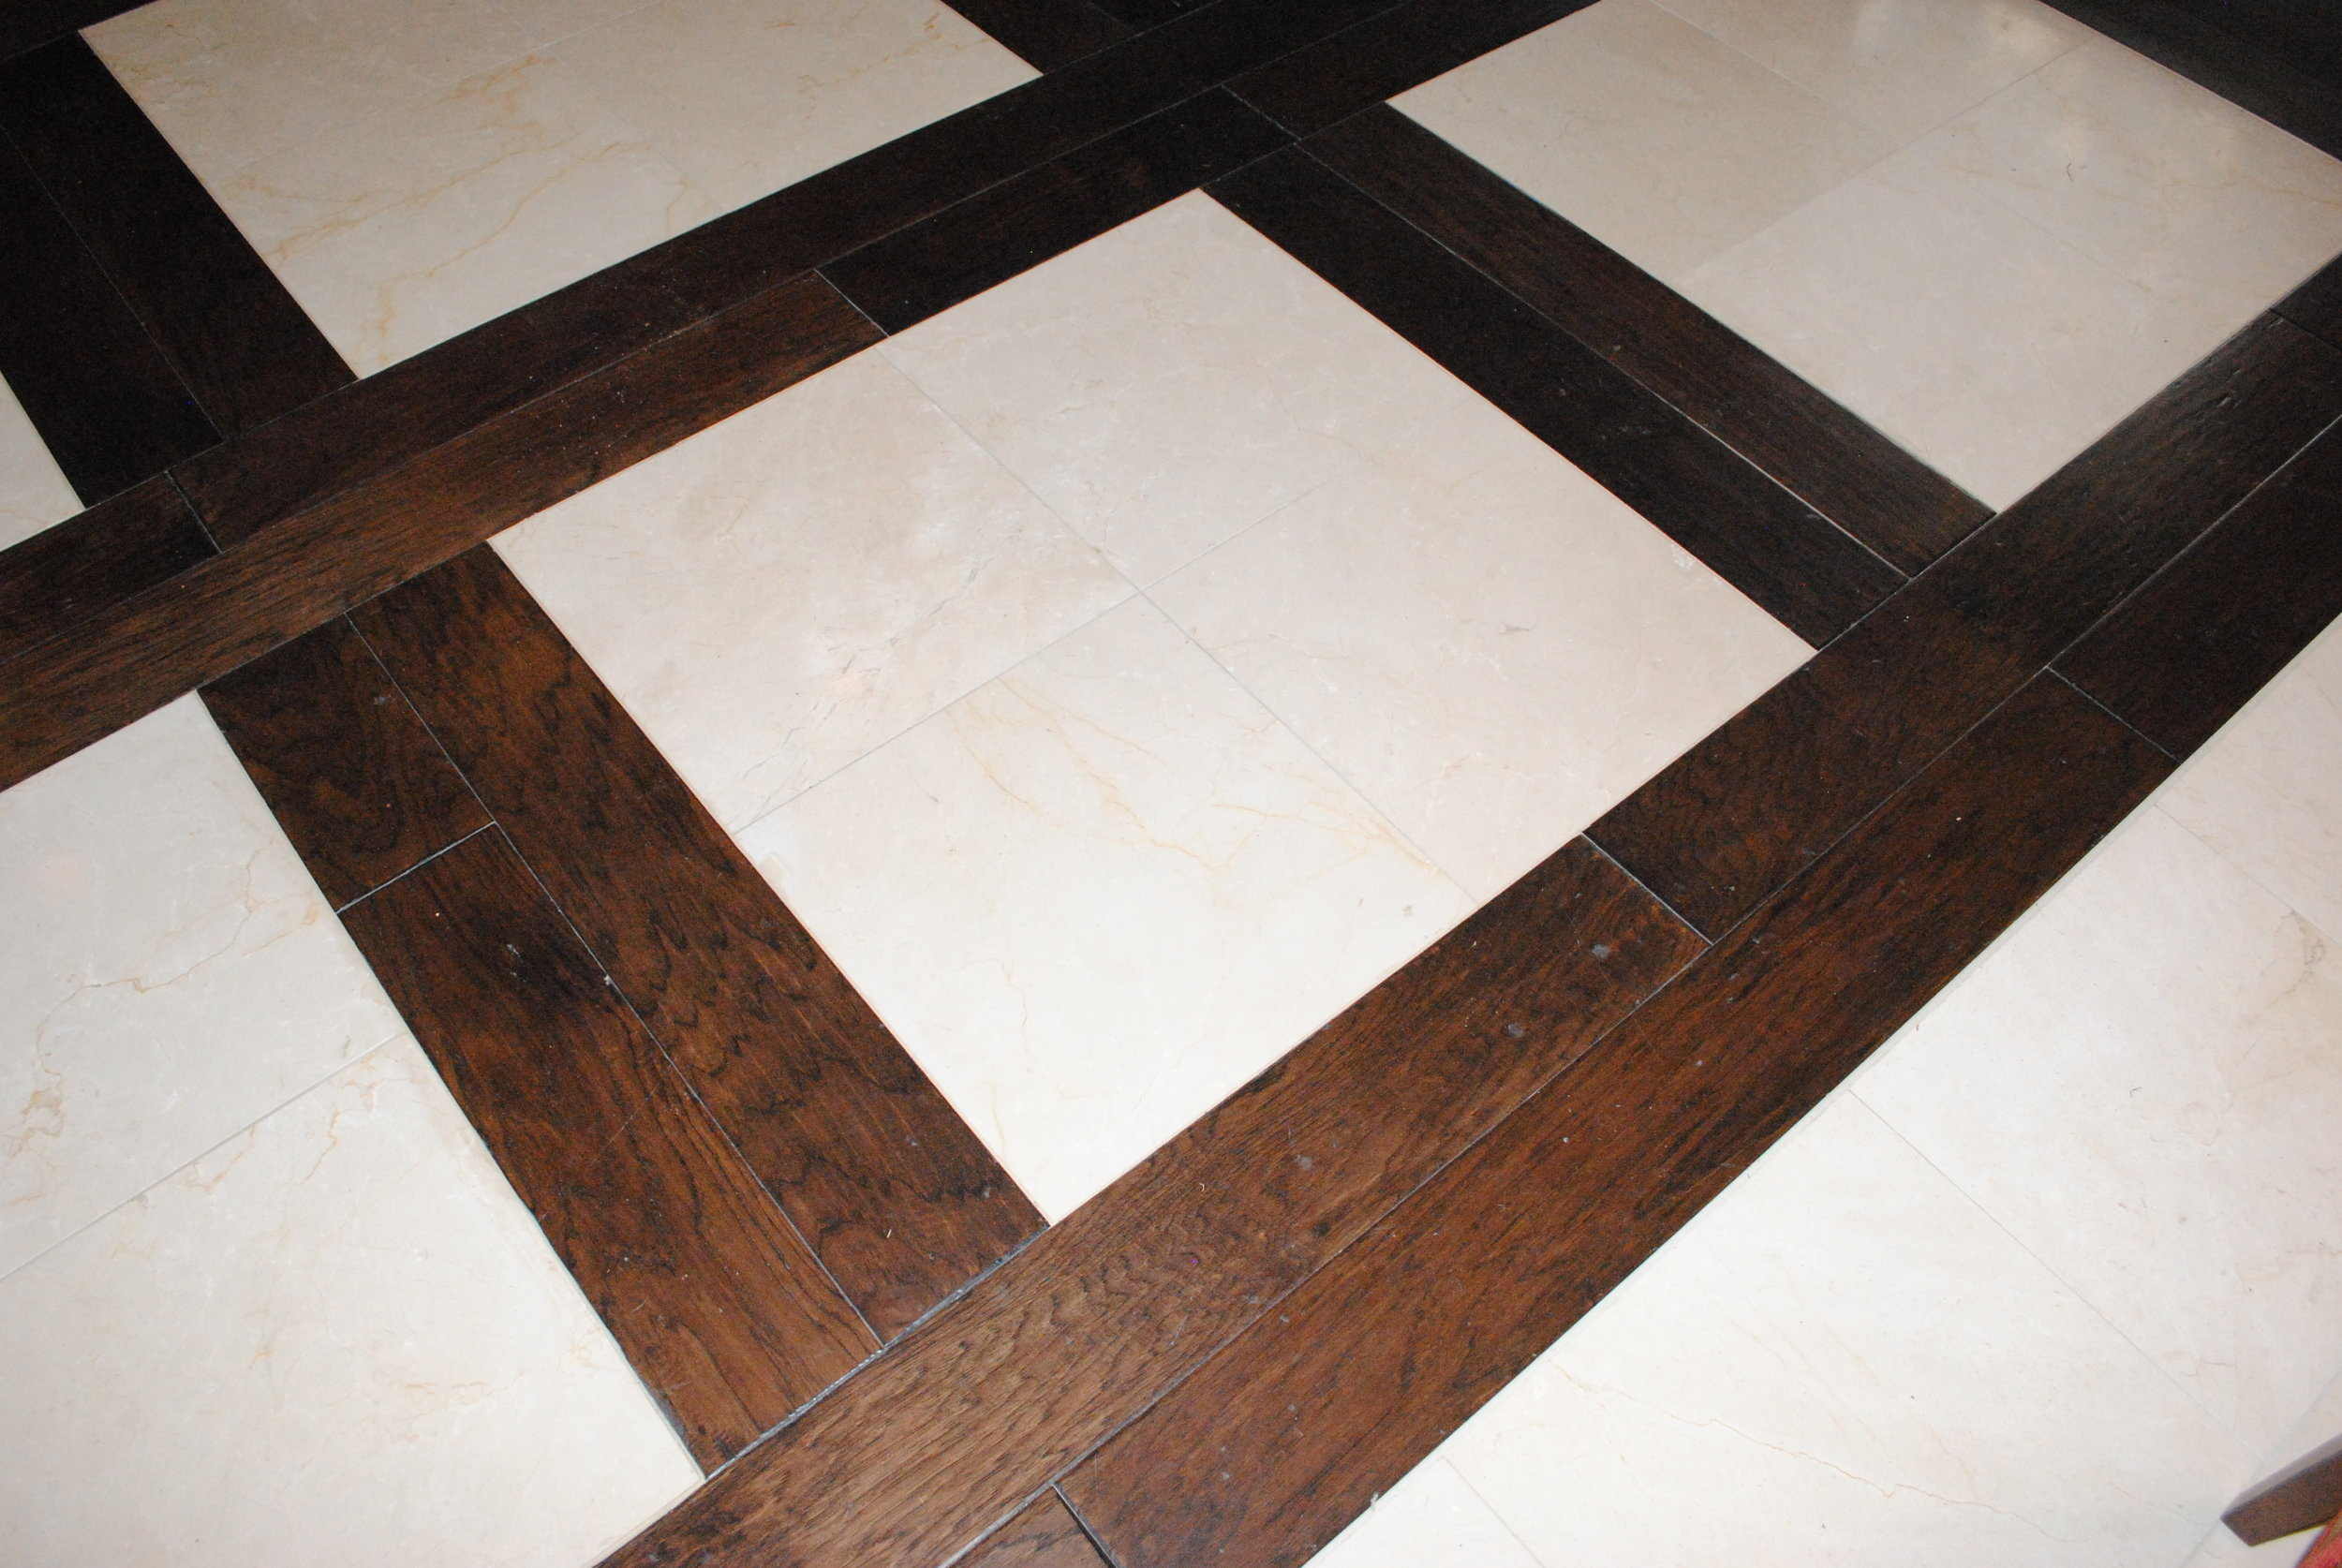 Hardwood floors with tile inlays